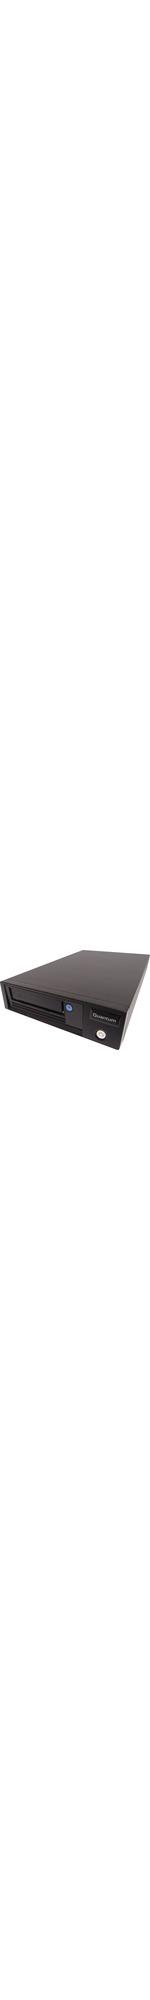 Quantum LTO-5 Tape Drive - 1.50 TB Native/3 TB Compressed - Black - 6Gb/s SAS - 1/2H Height